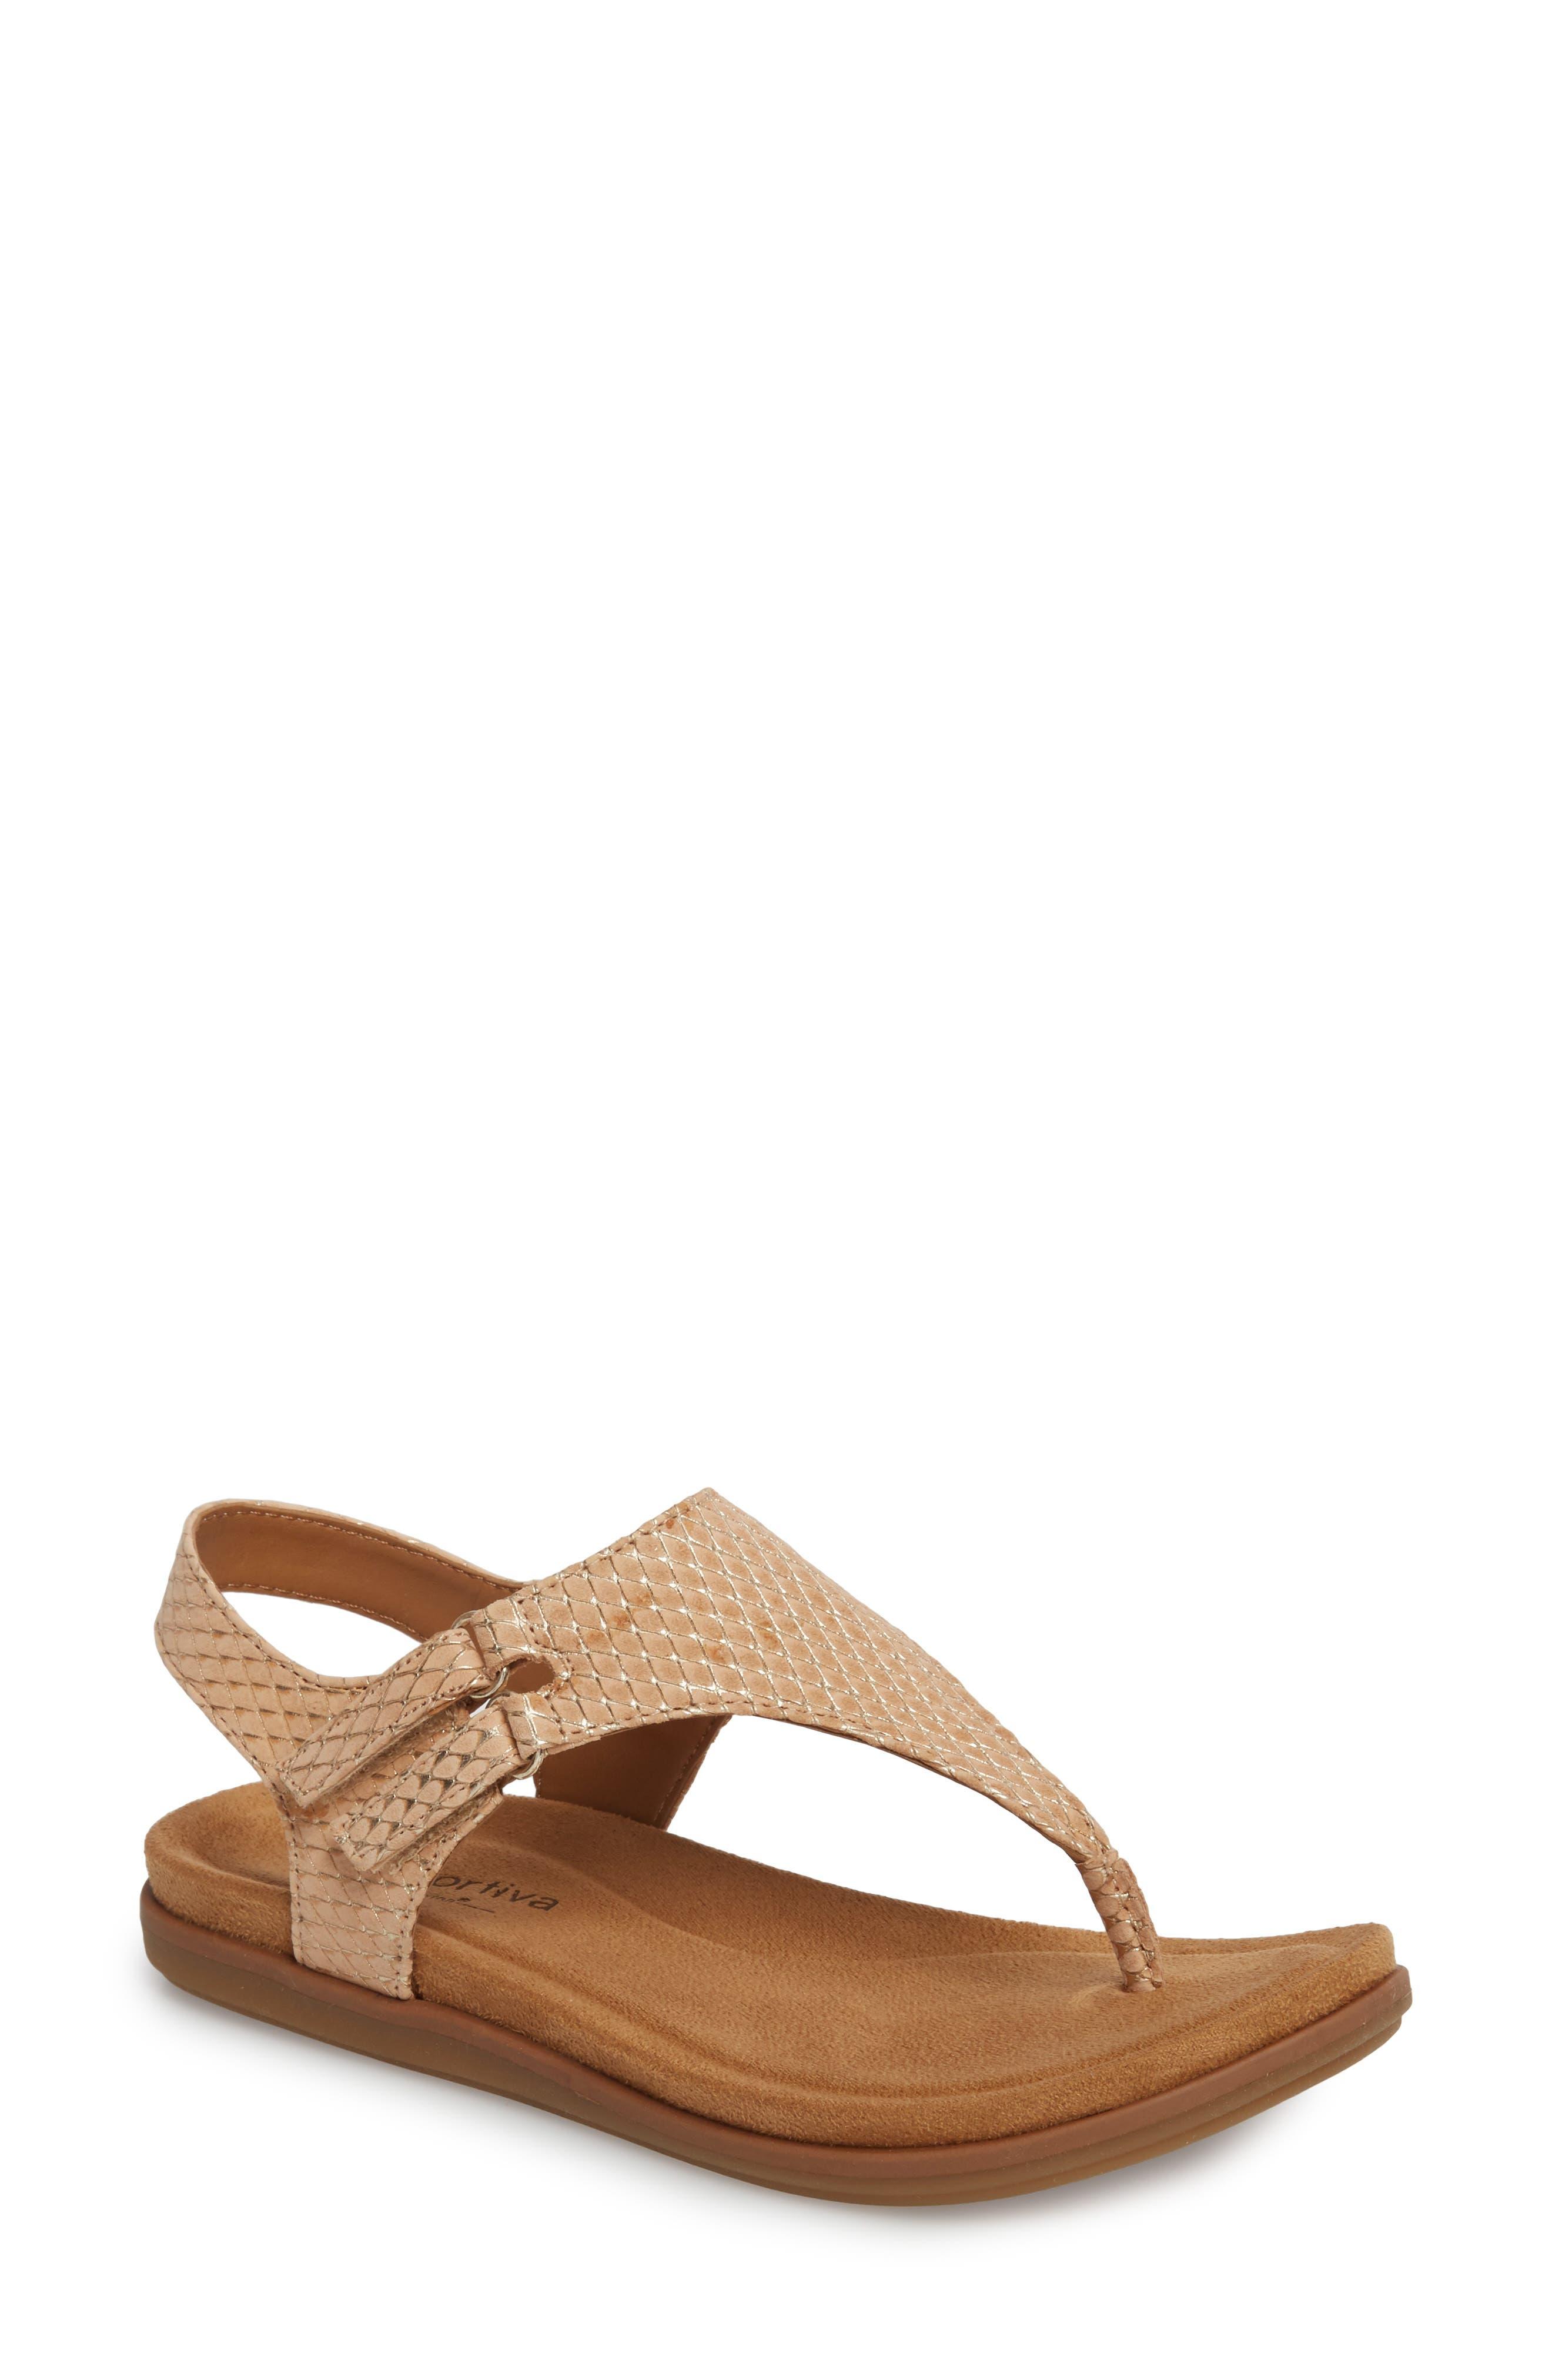 Calina Sandal,                         Main,                         color, Sand Nubuck Leather